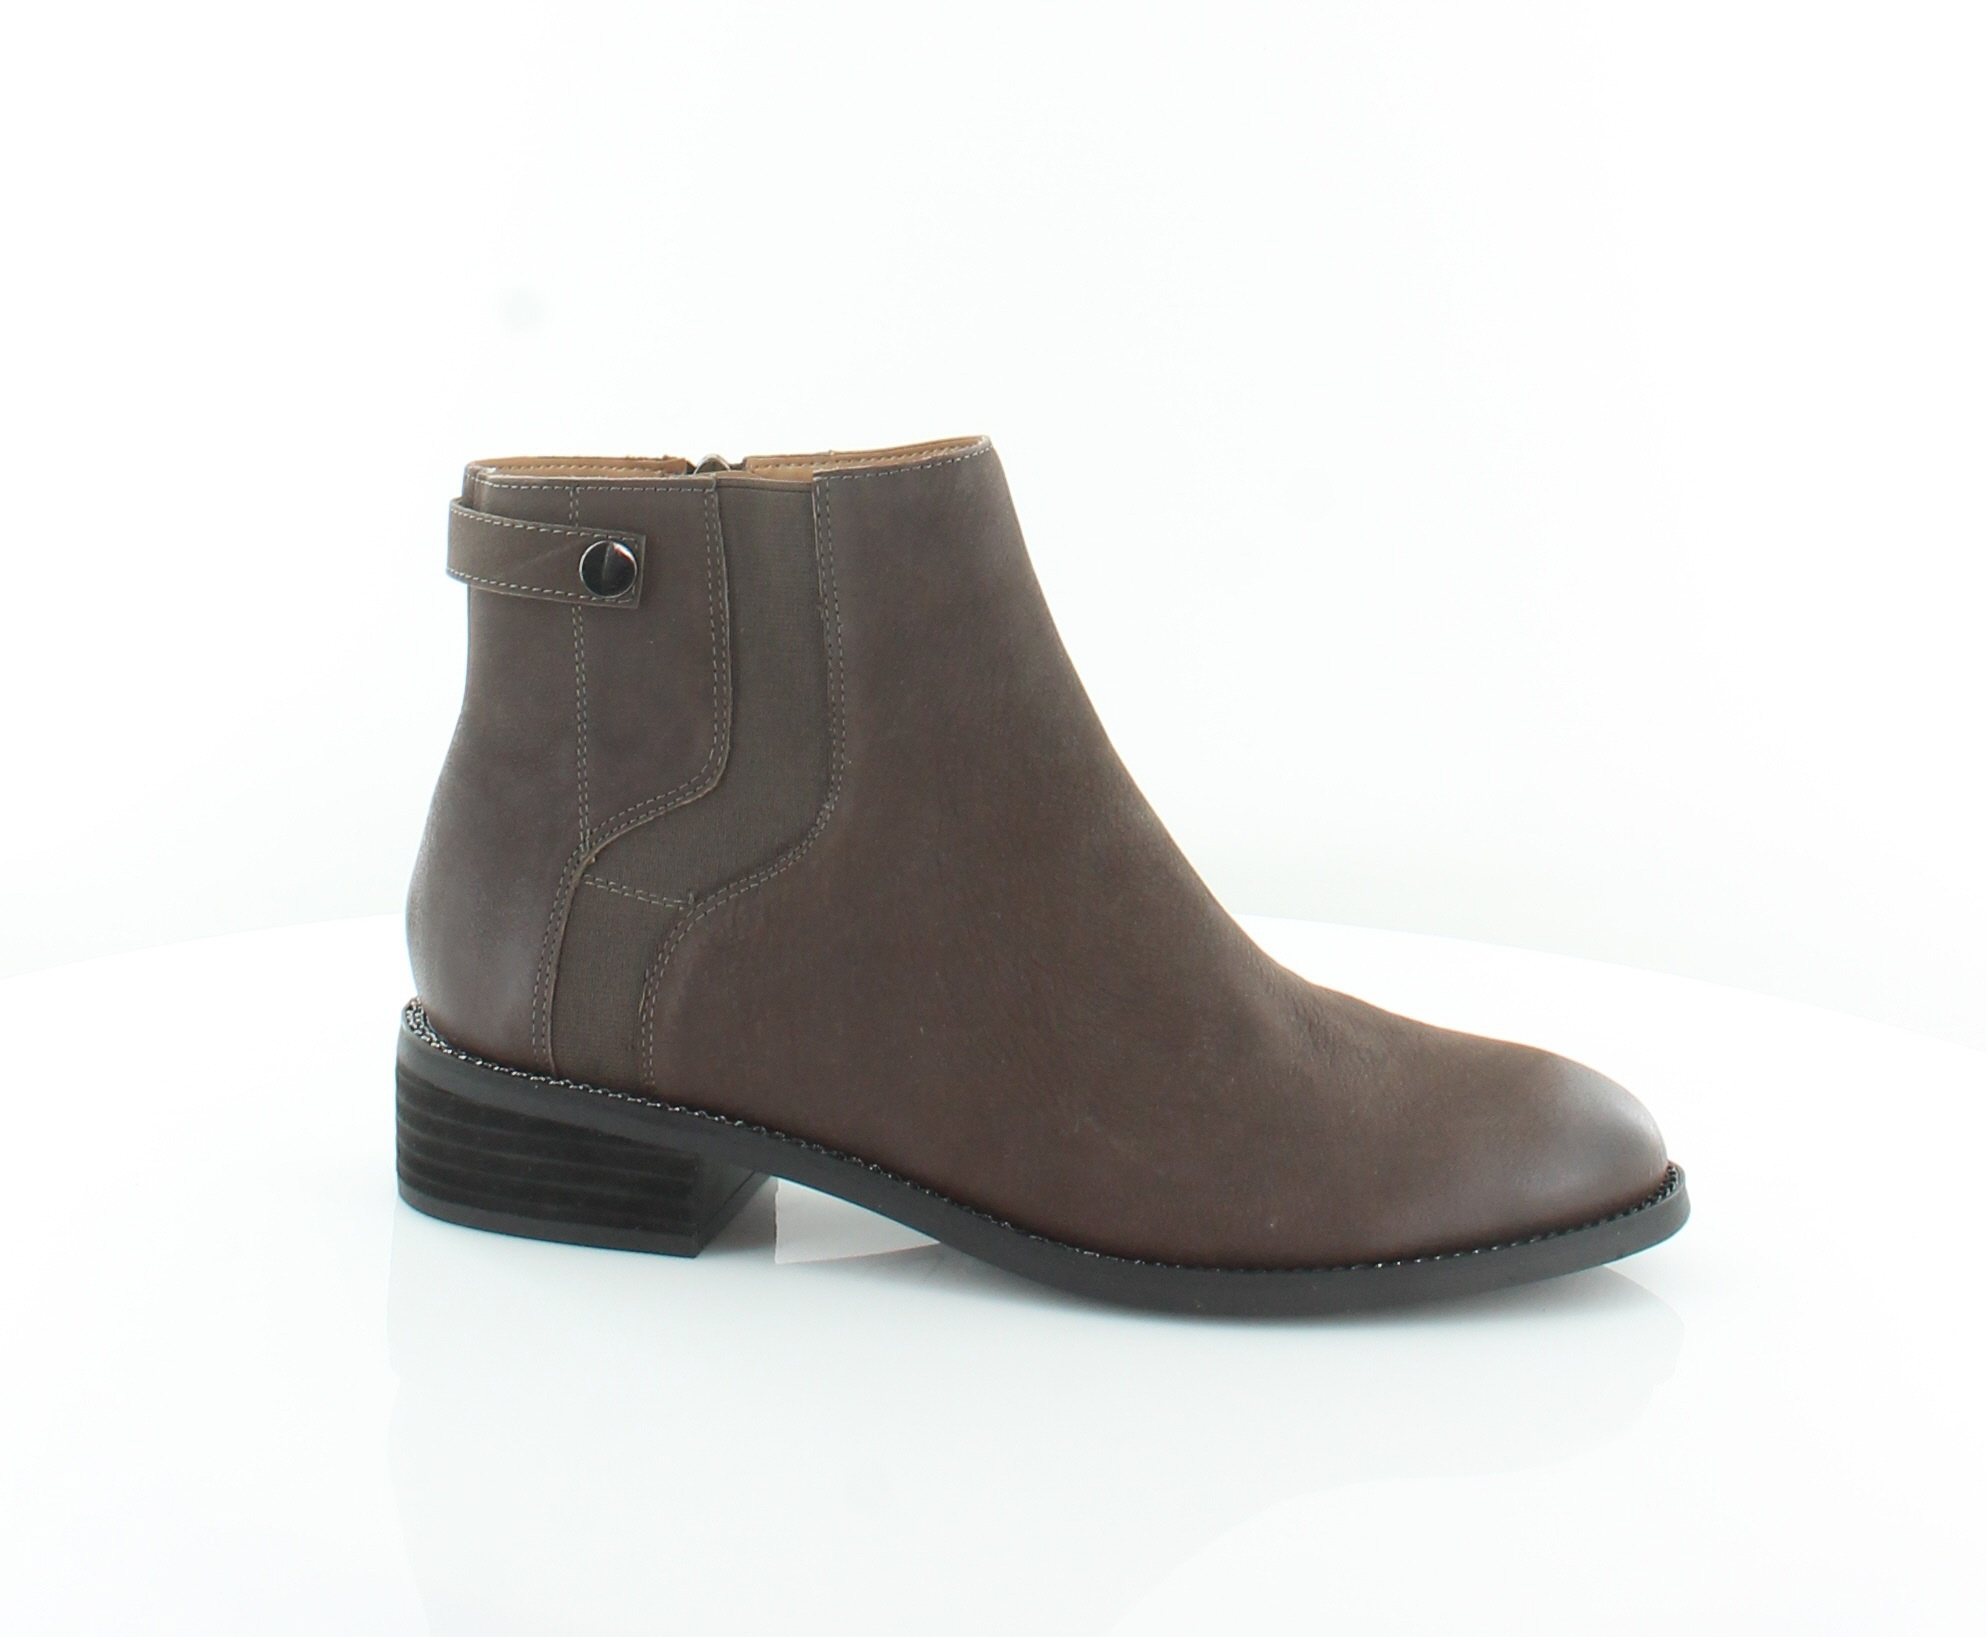 Franco Sarto Brandy Women's Boots Peat